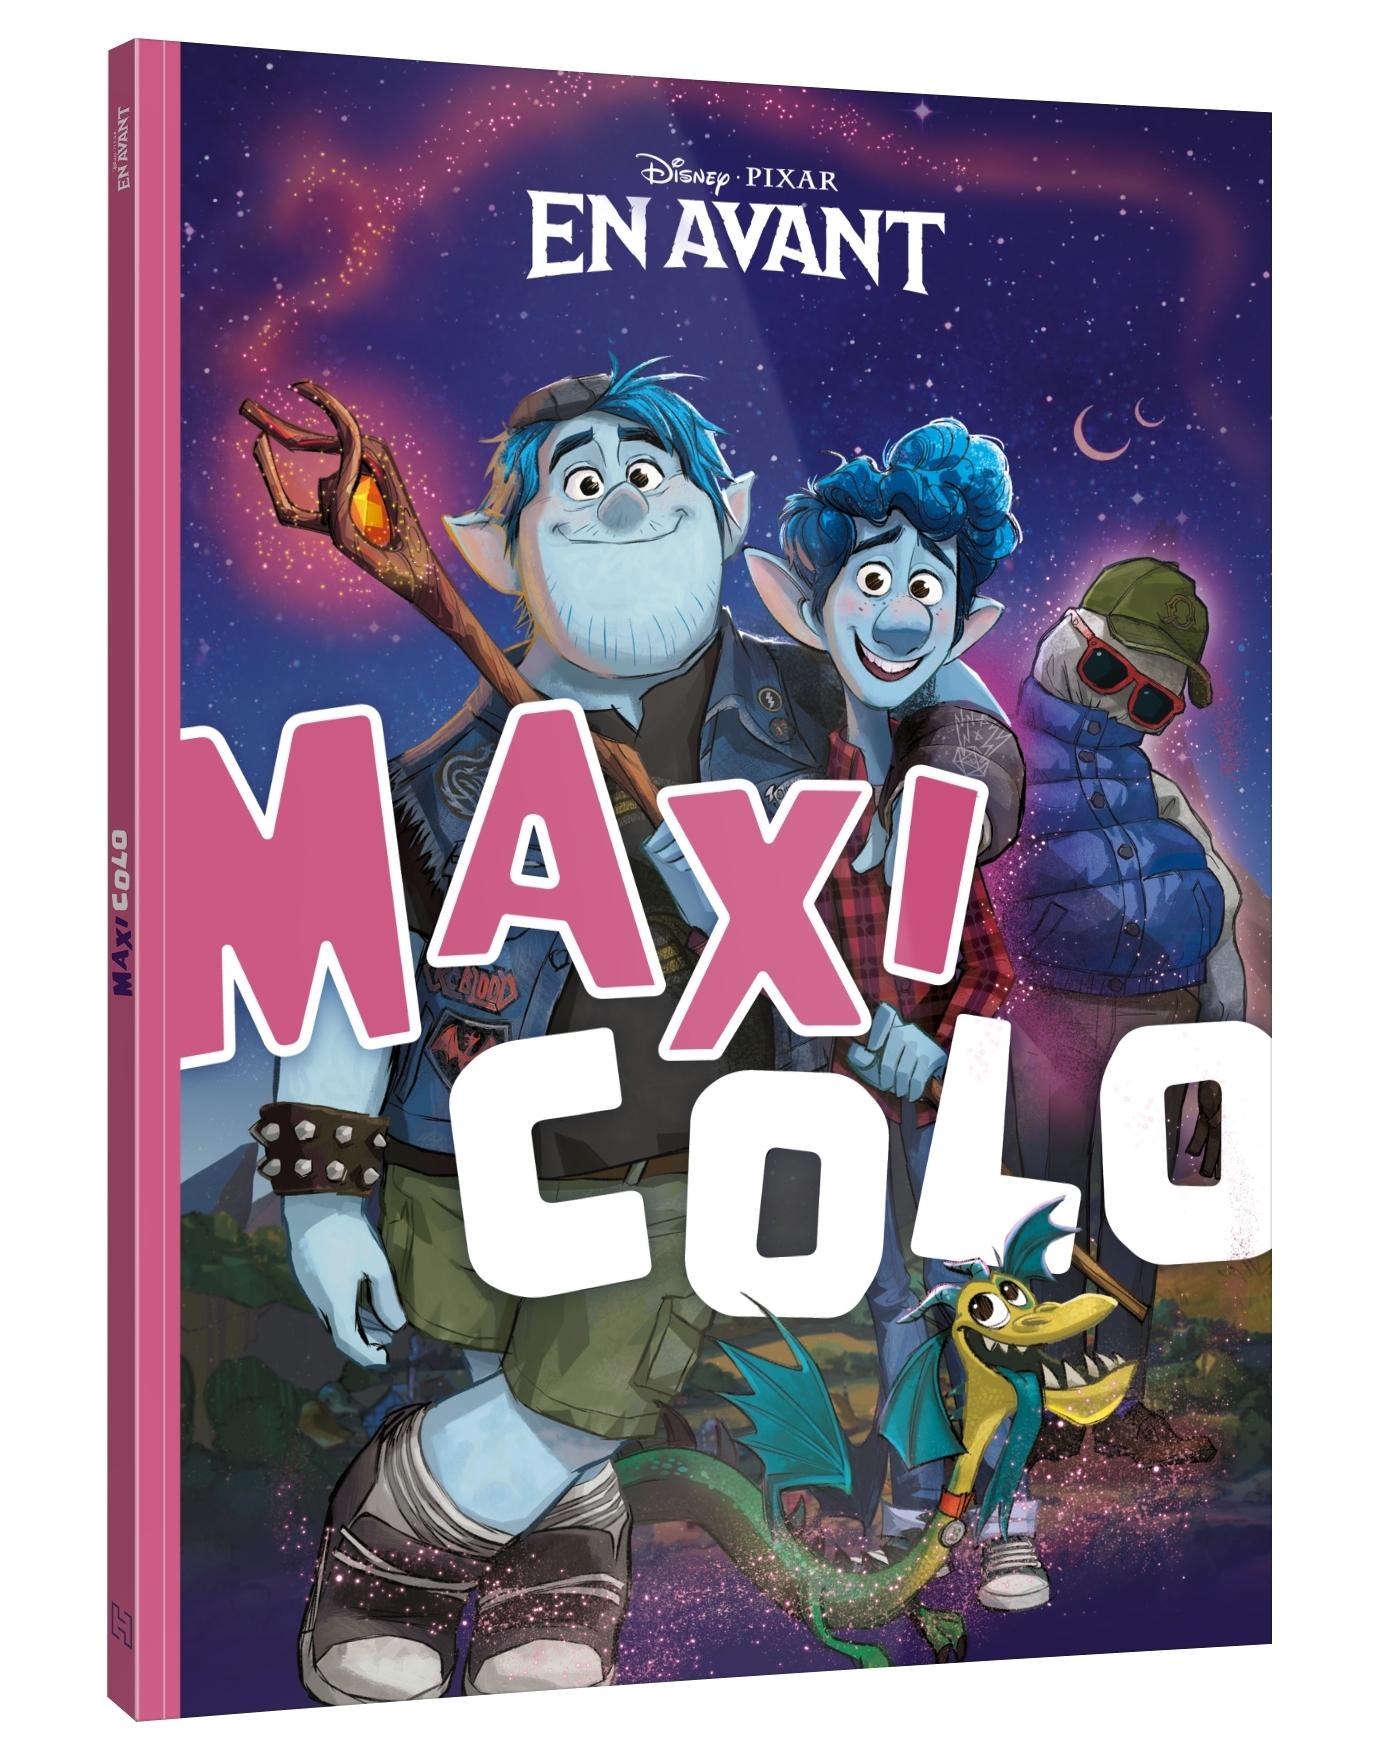 EN AVANT - MAXI COLO - DISNEY PIXAR